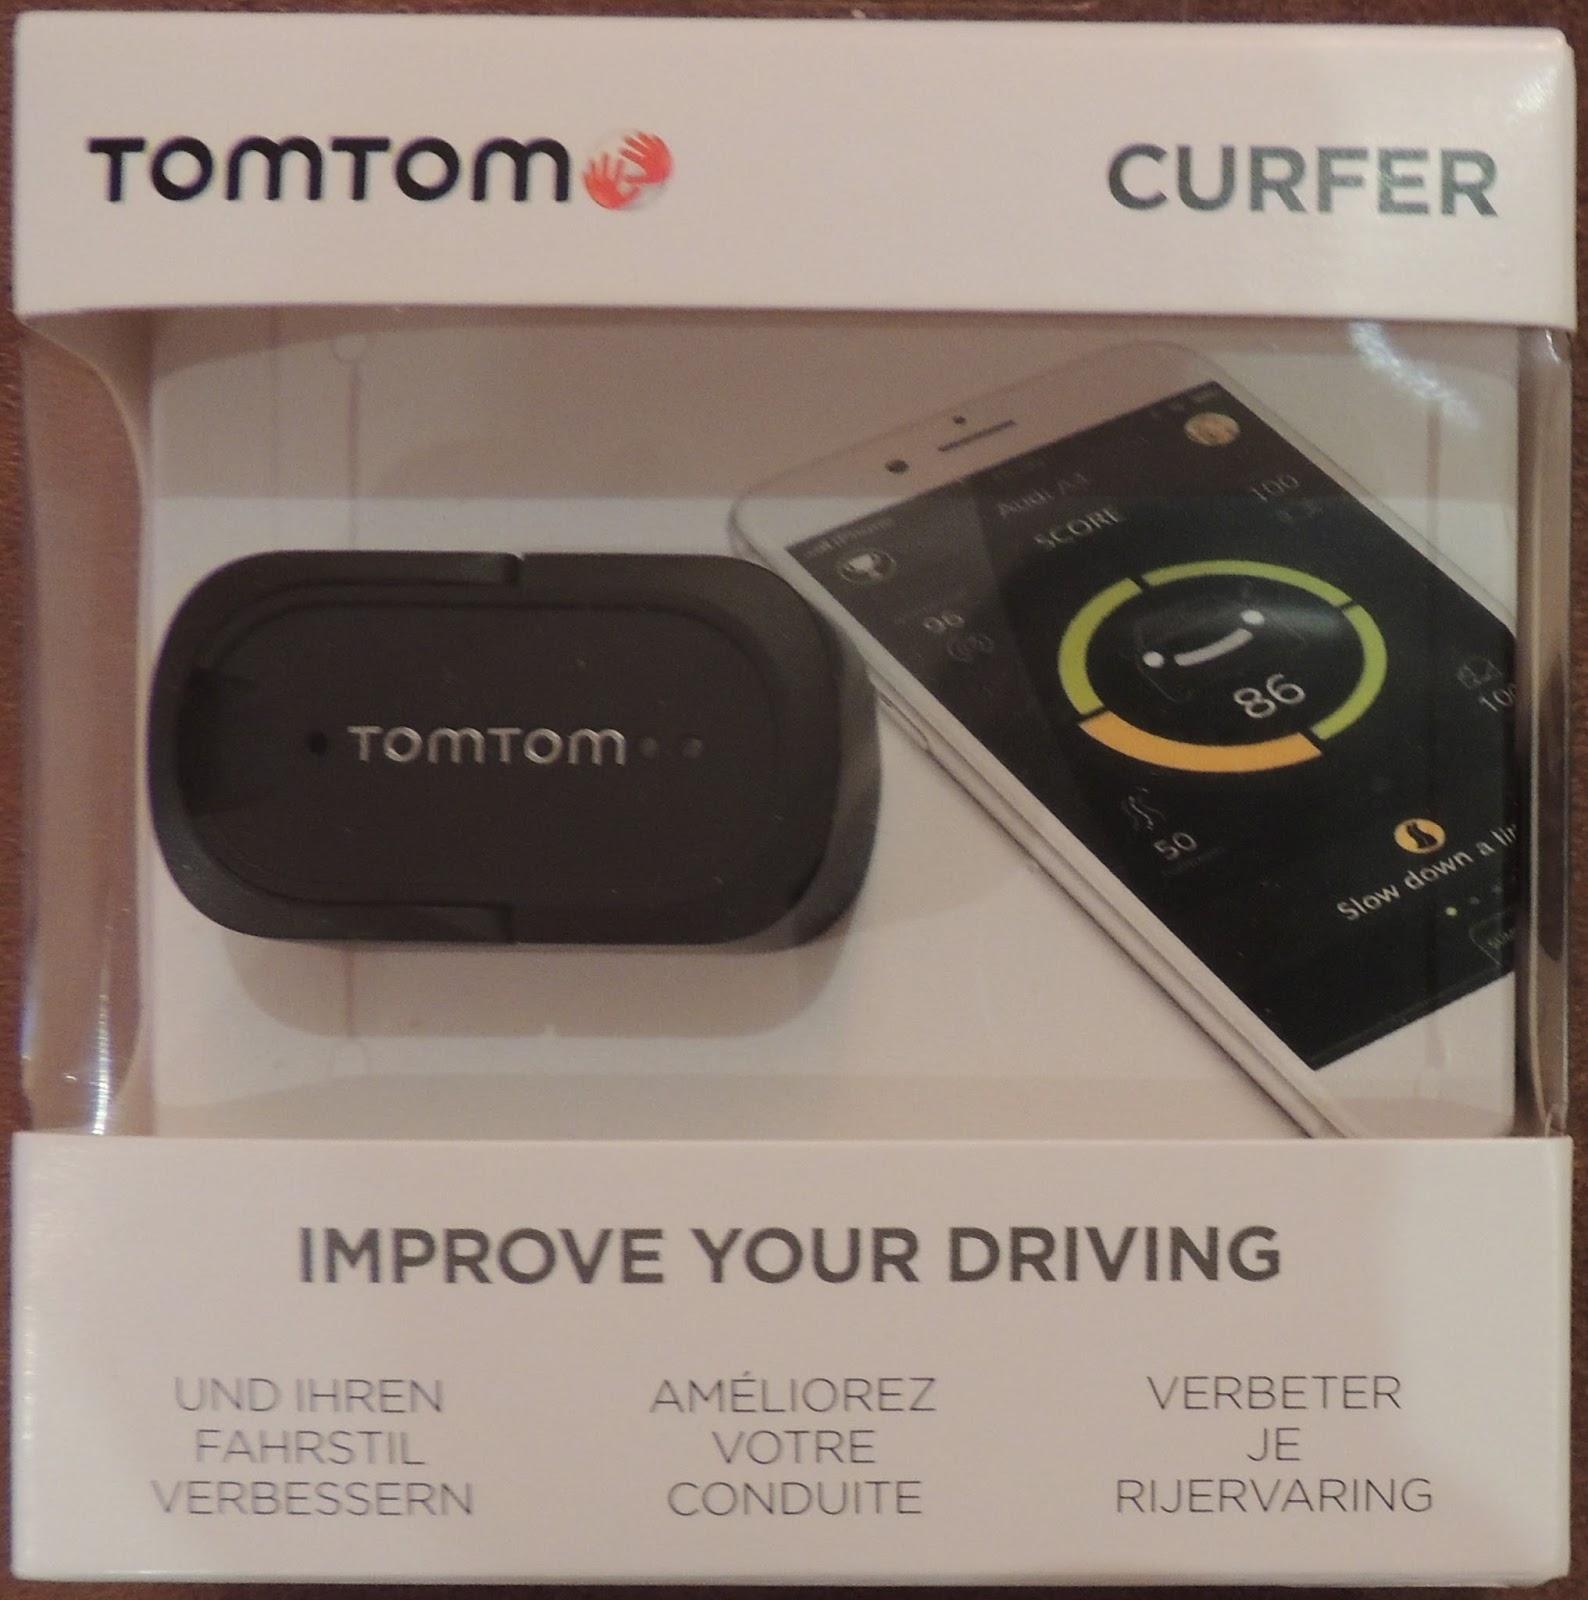 Produkttest Familie: TomTom Curfer (Dashboard zur ...